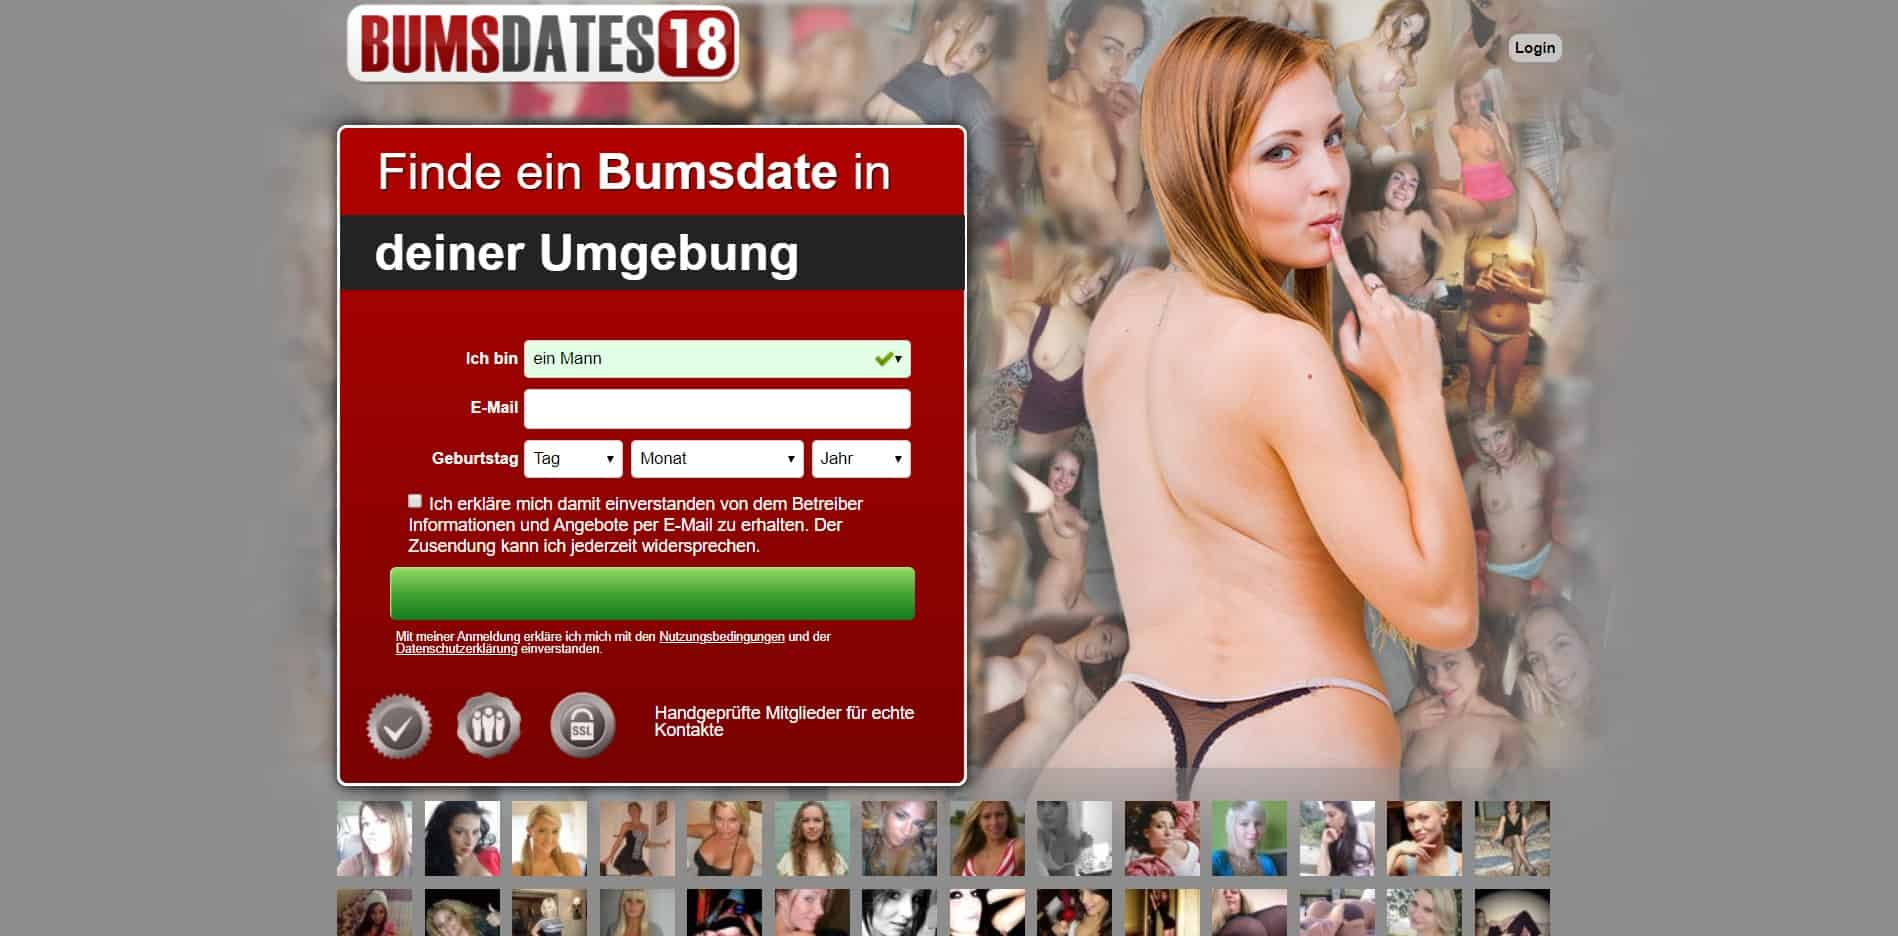 Testbericht: BumsDates18.com Abzocke